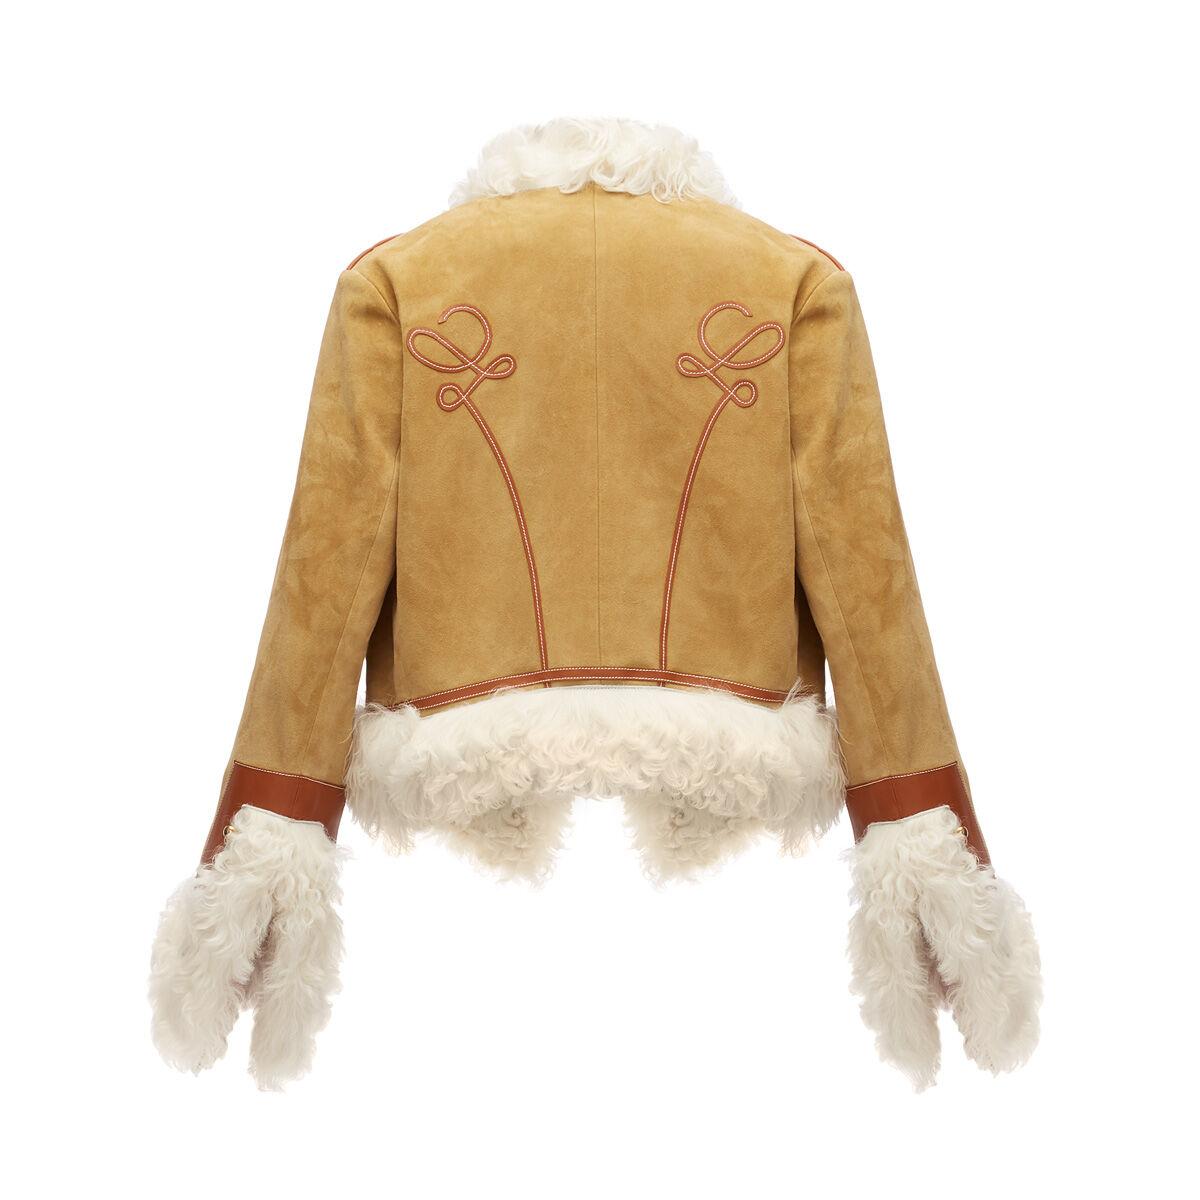 LOEWE Military Shearling Jacket Gold all